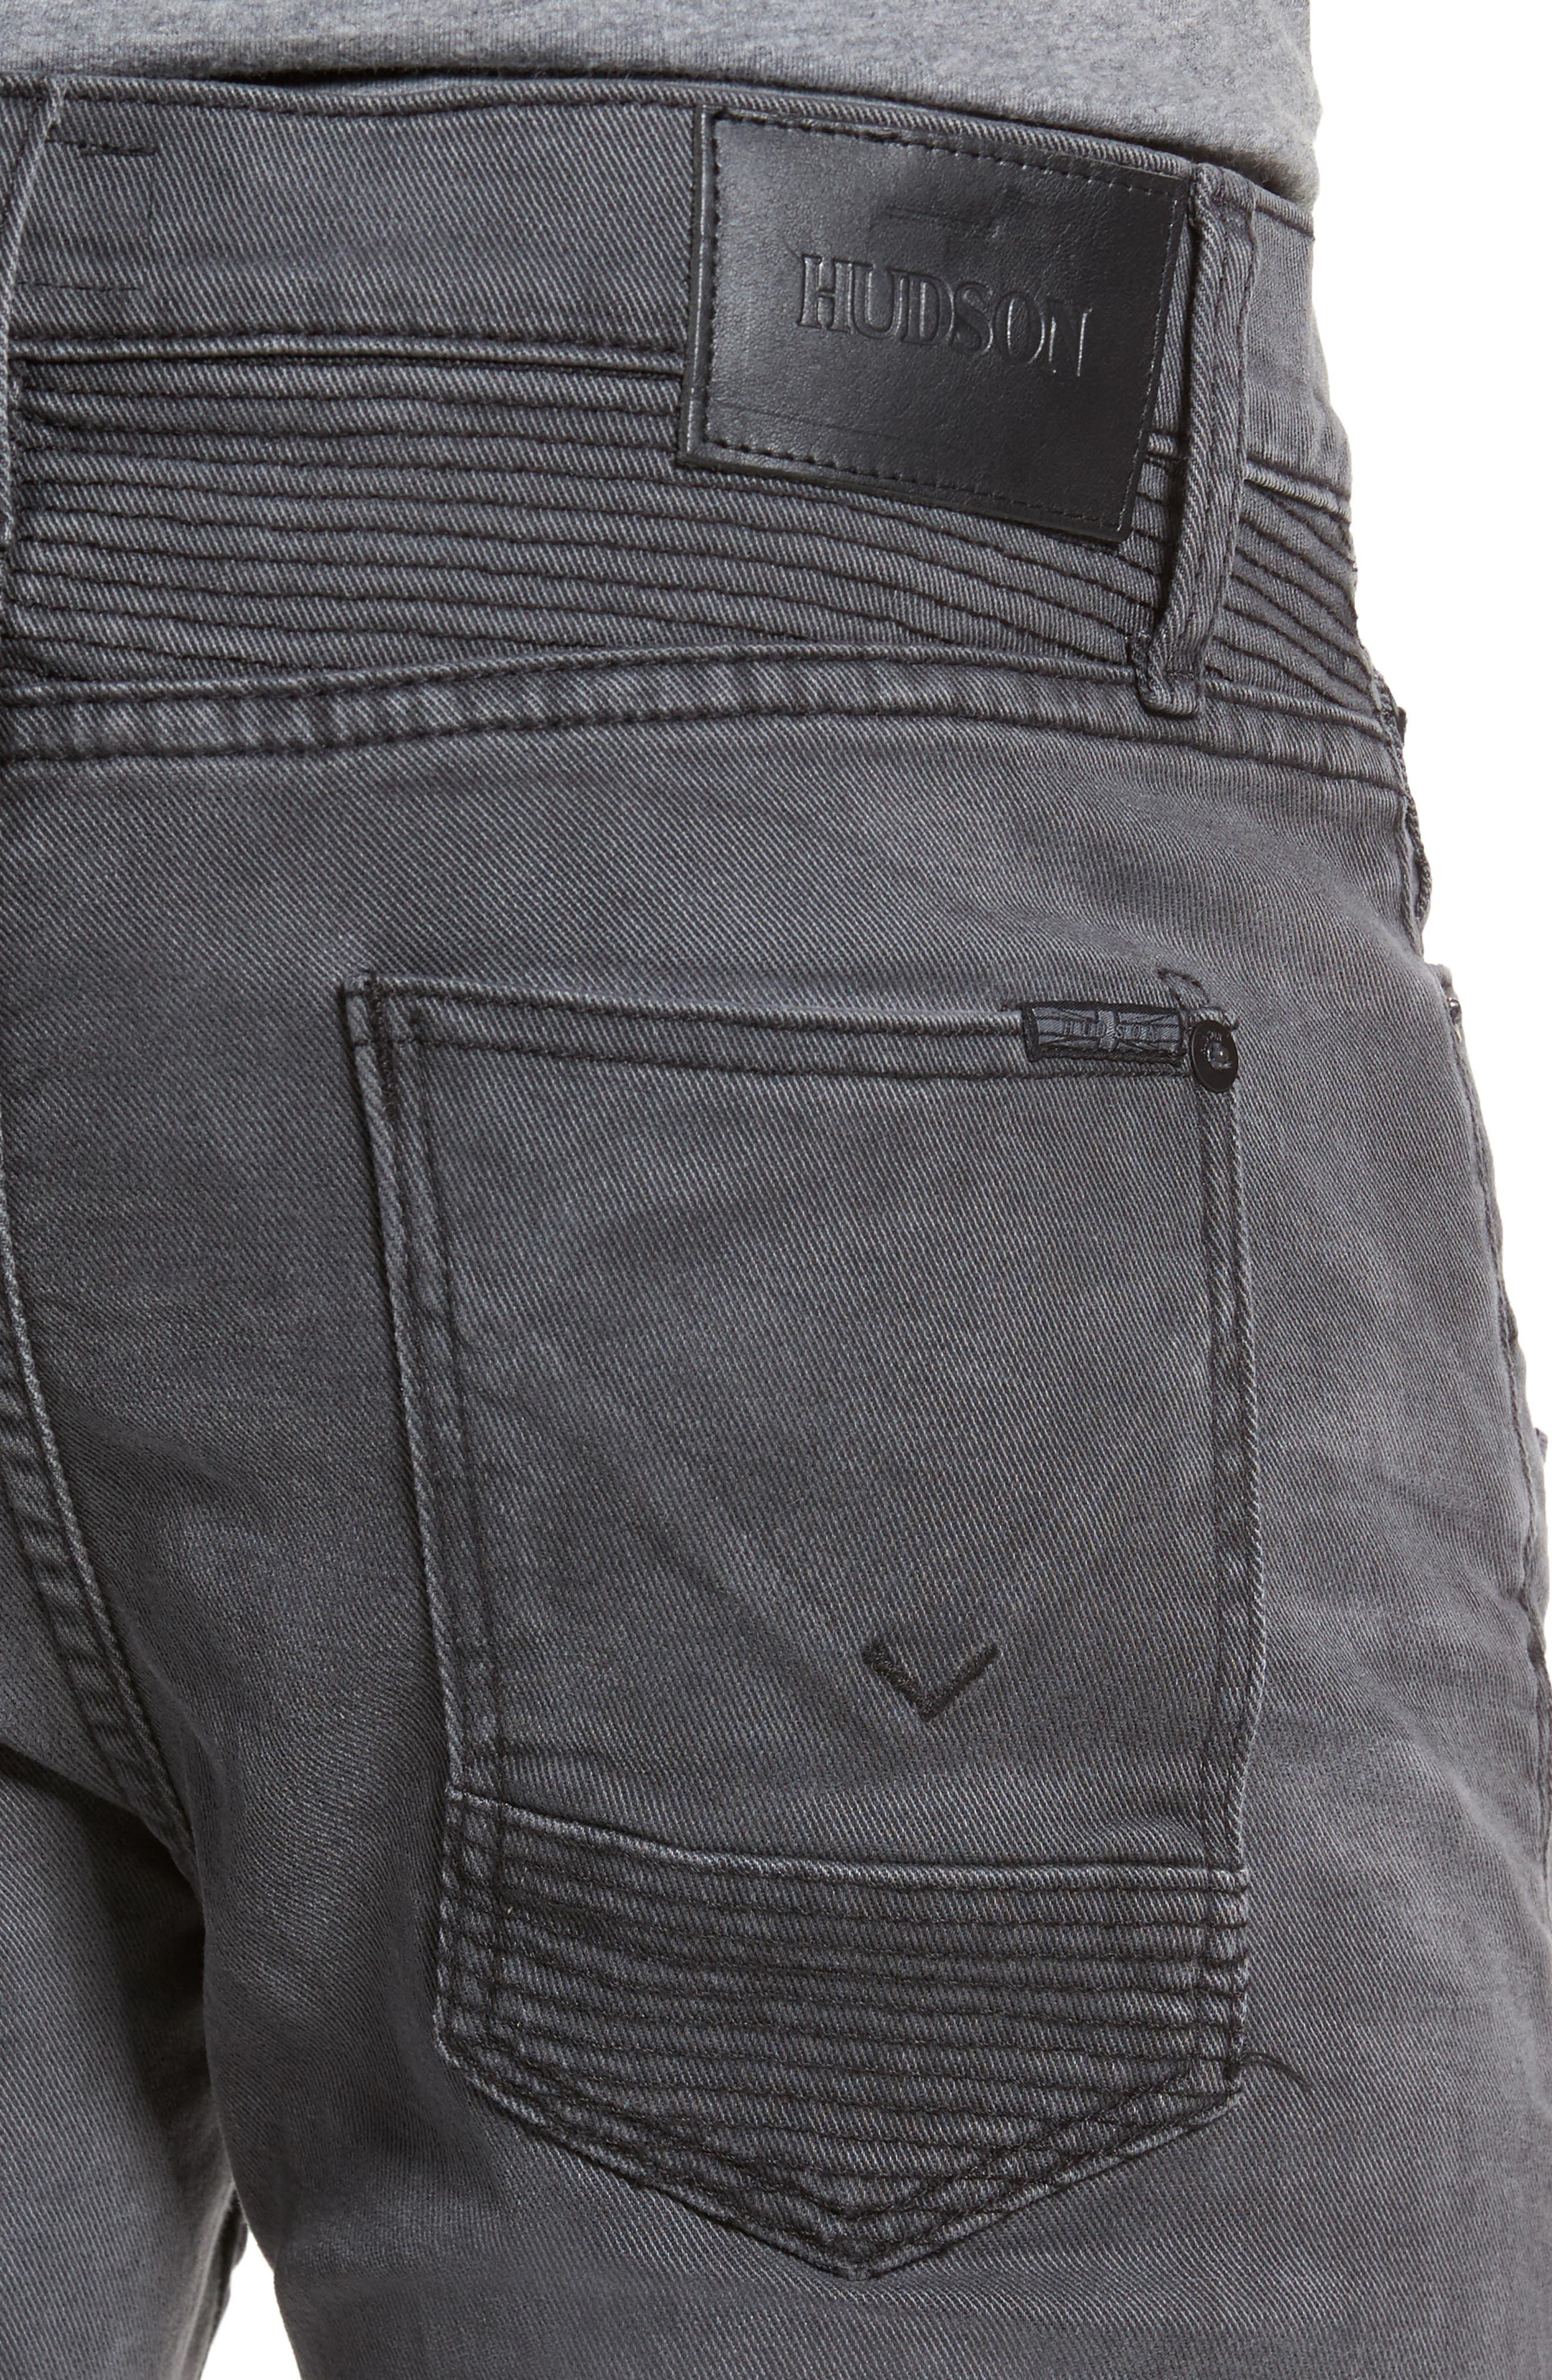 Blinder Biker Moto Skinny Fit Jeans,                             Alternate thumbnail 4, color,                             MIXTAPE